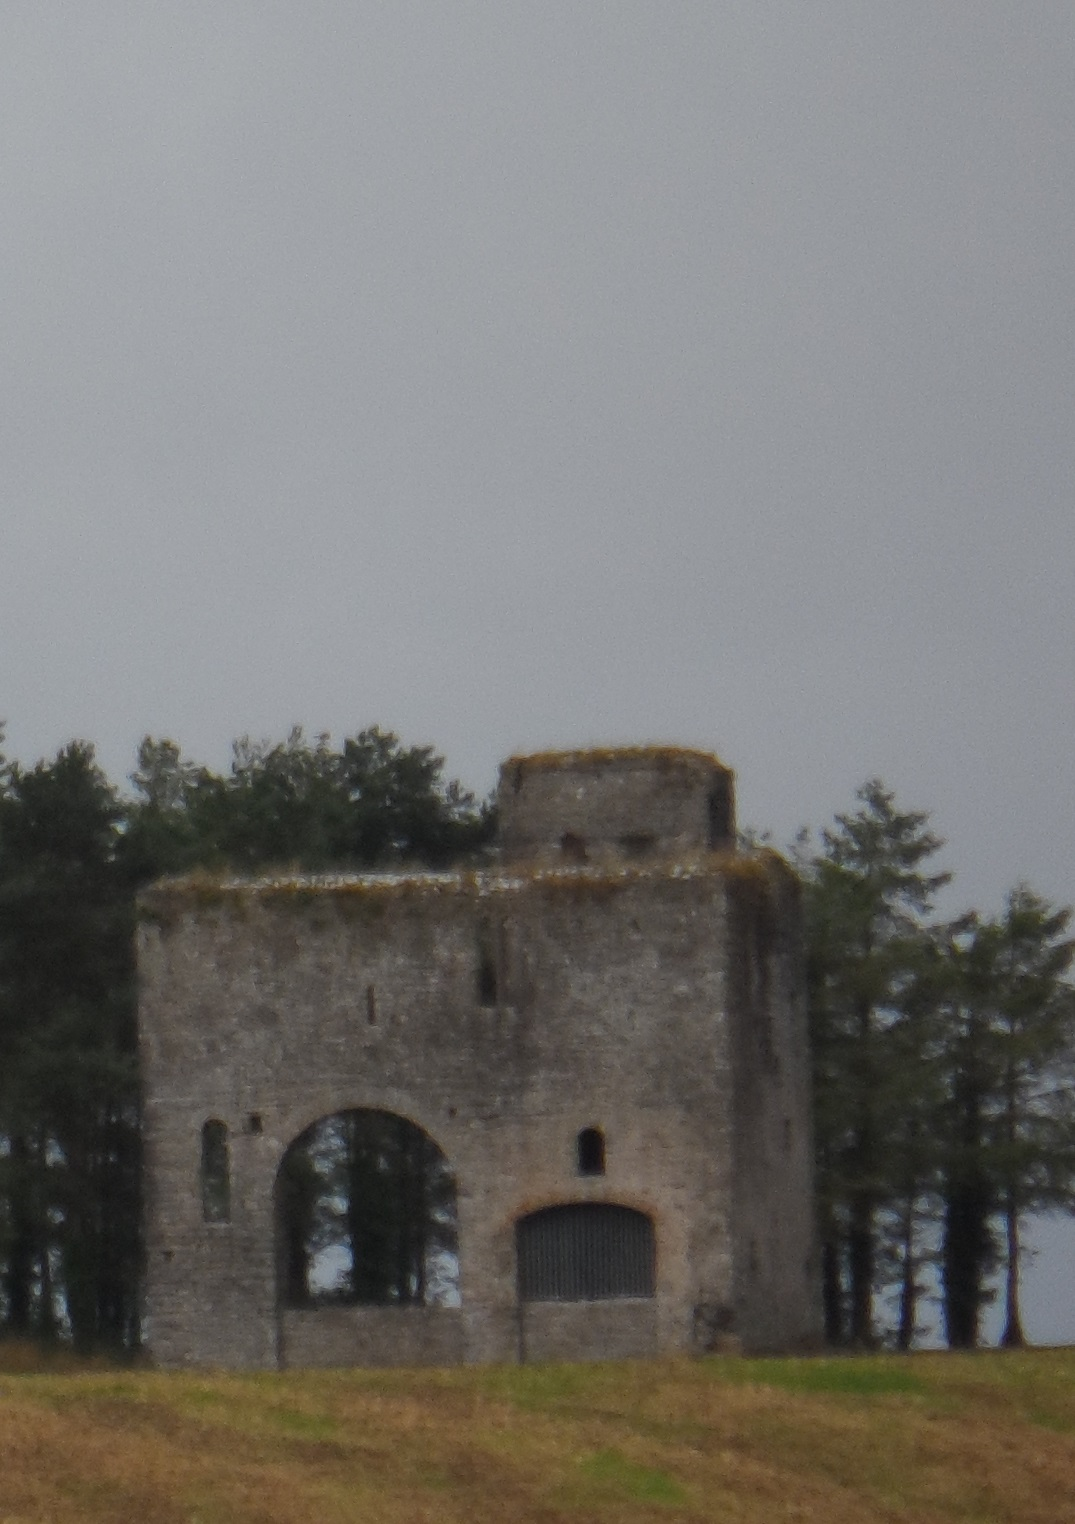 Rathcoffey Castle  Wikipedia